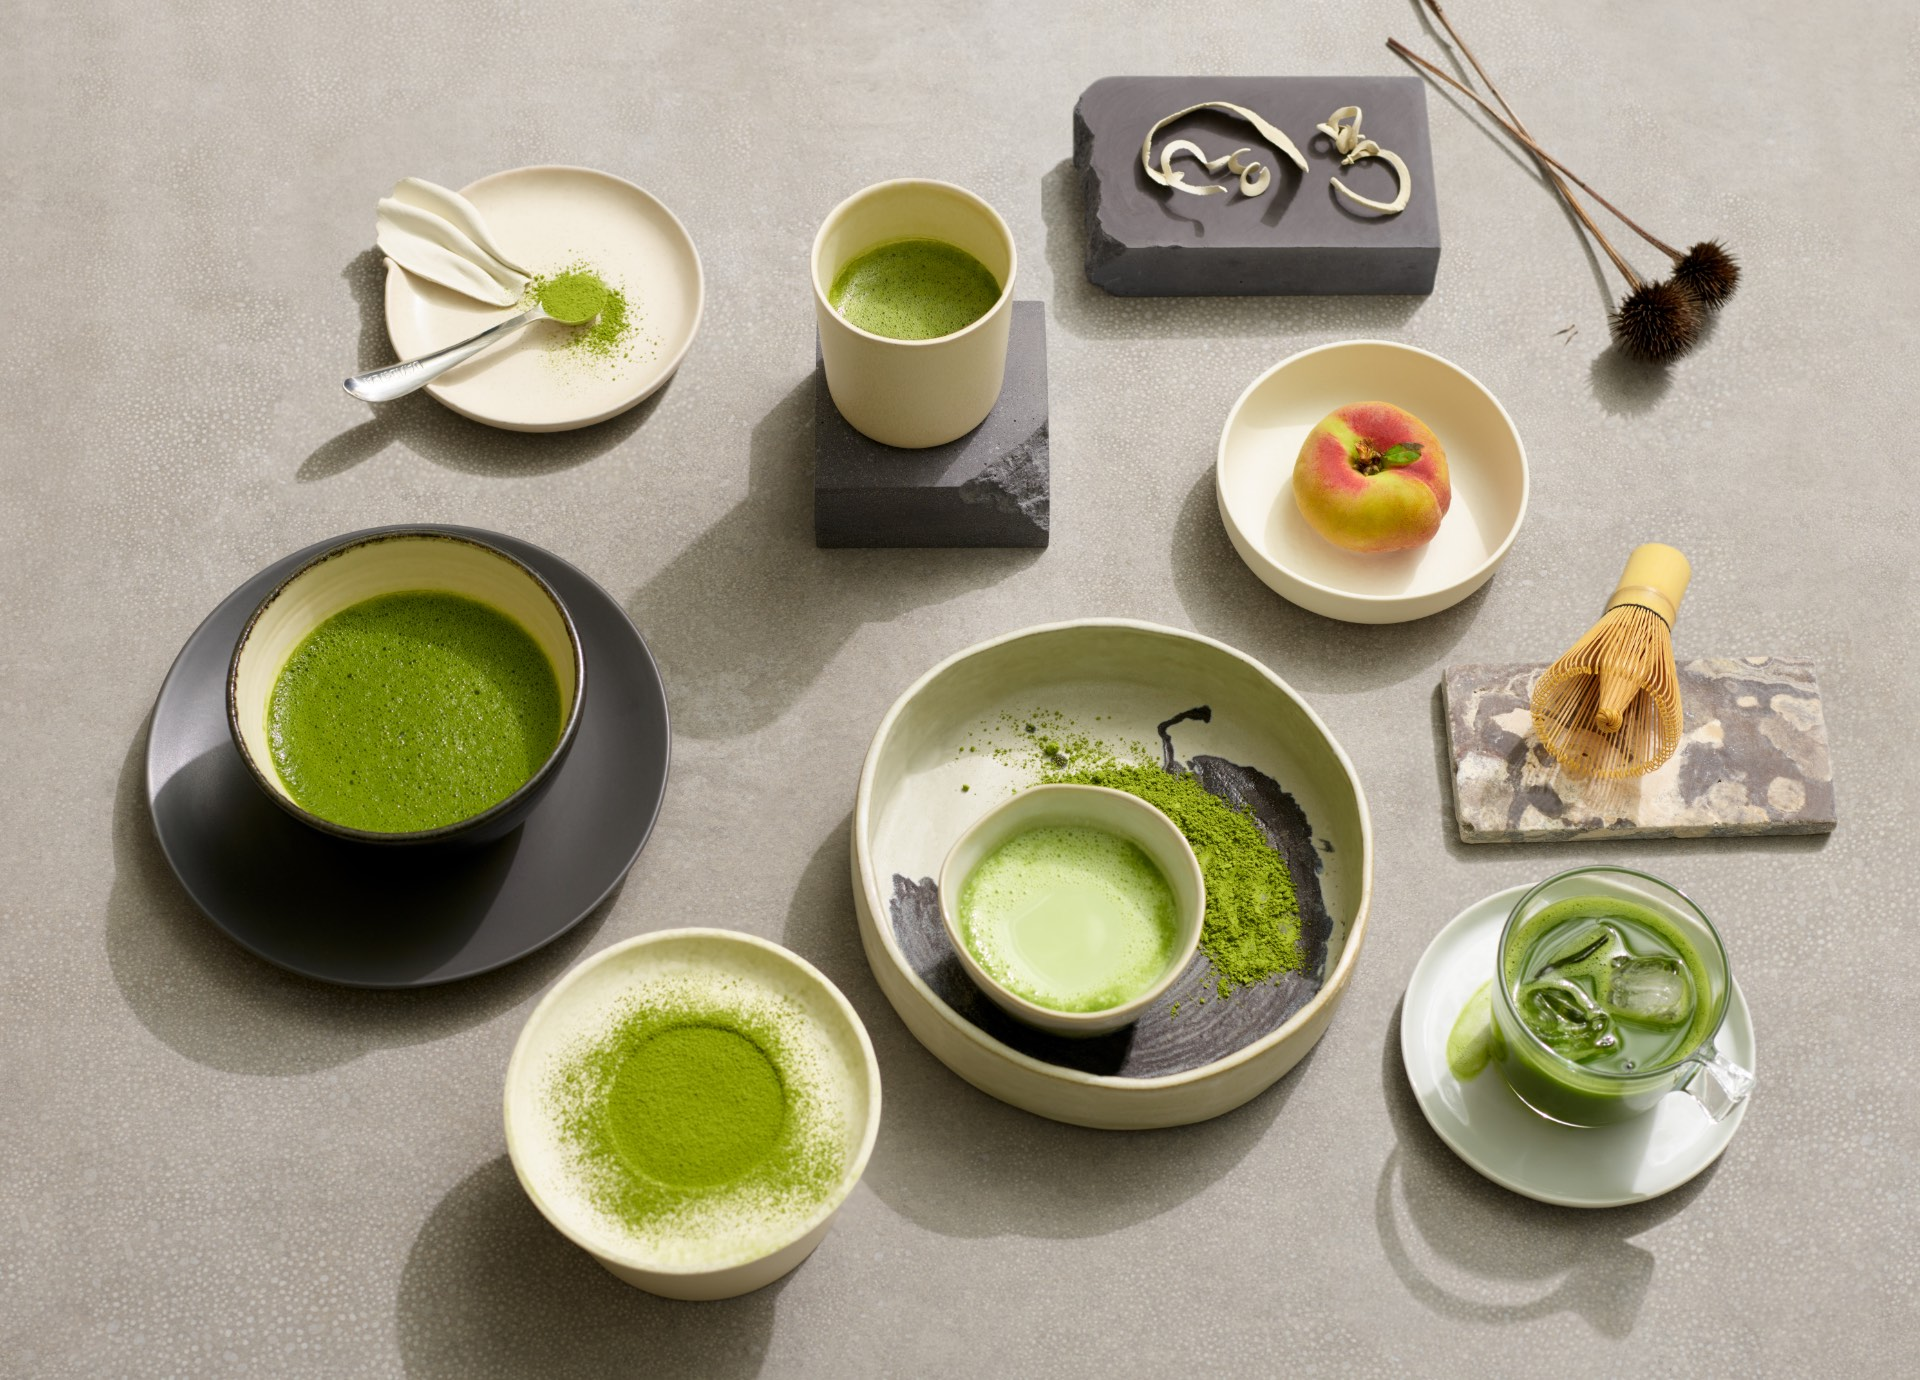 Matcha green tea prepared various ways in ceramic mugs, plates and bowls.